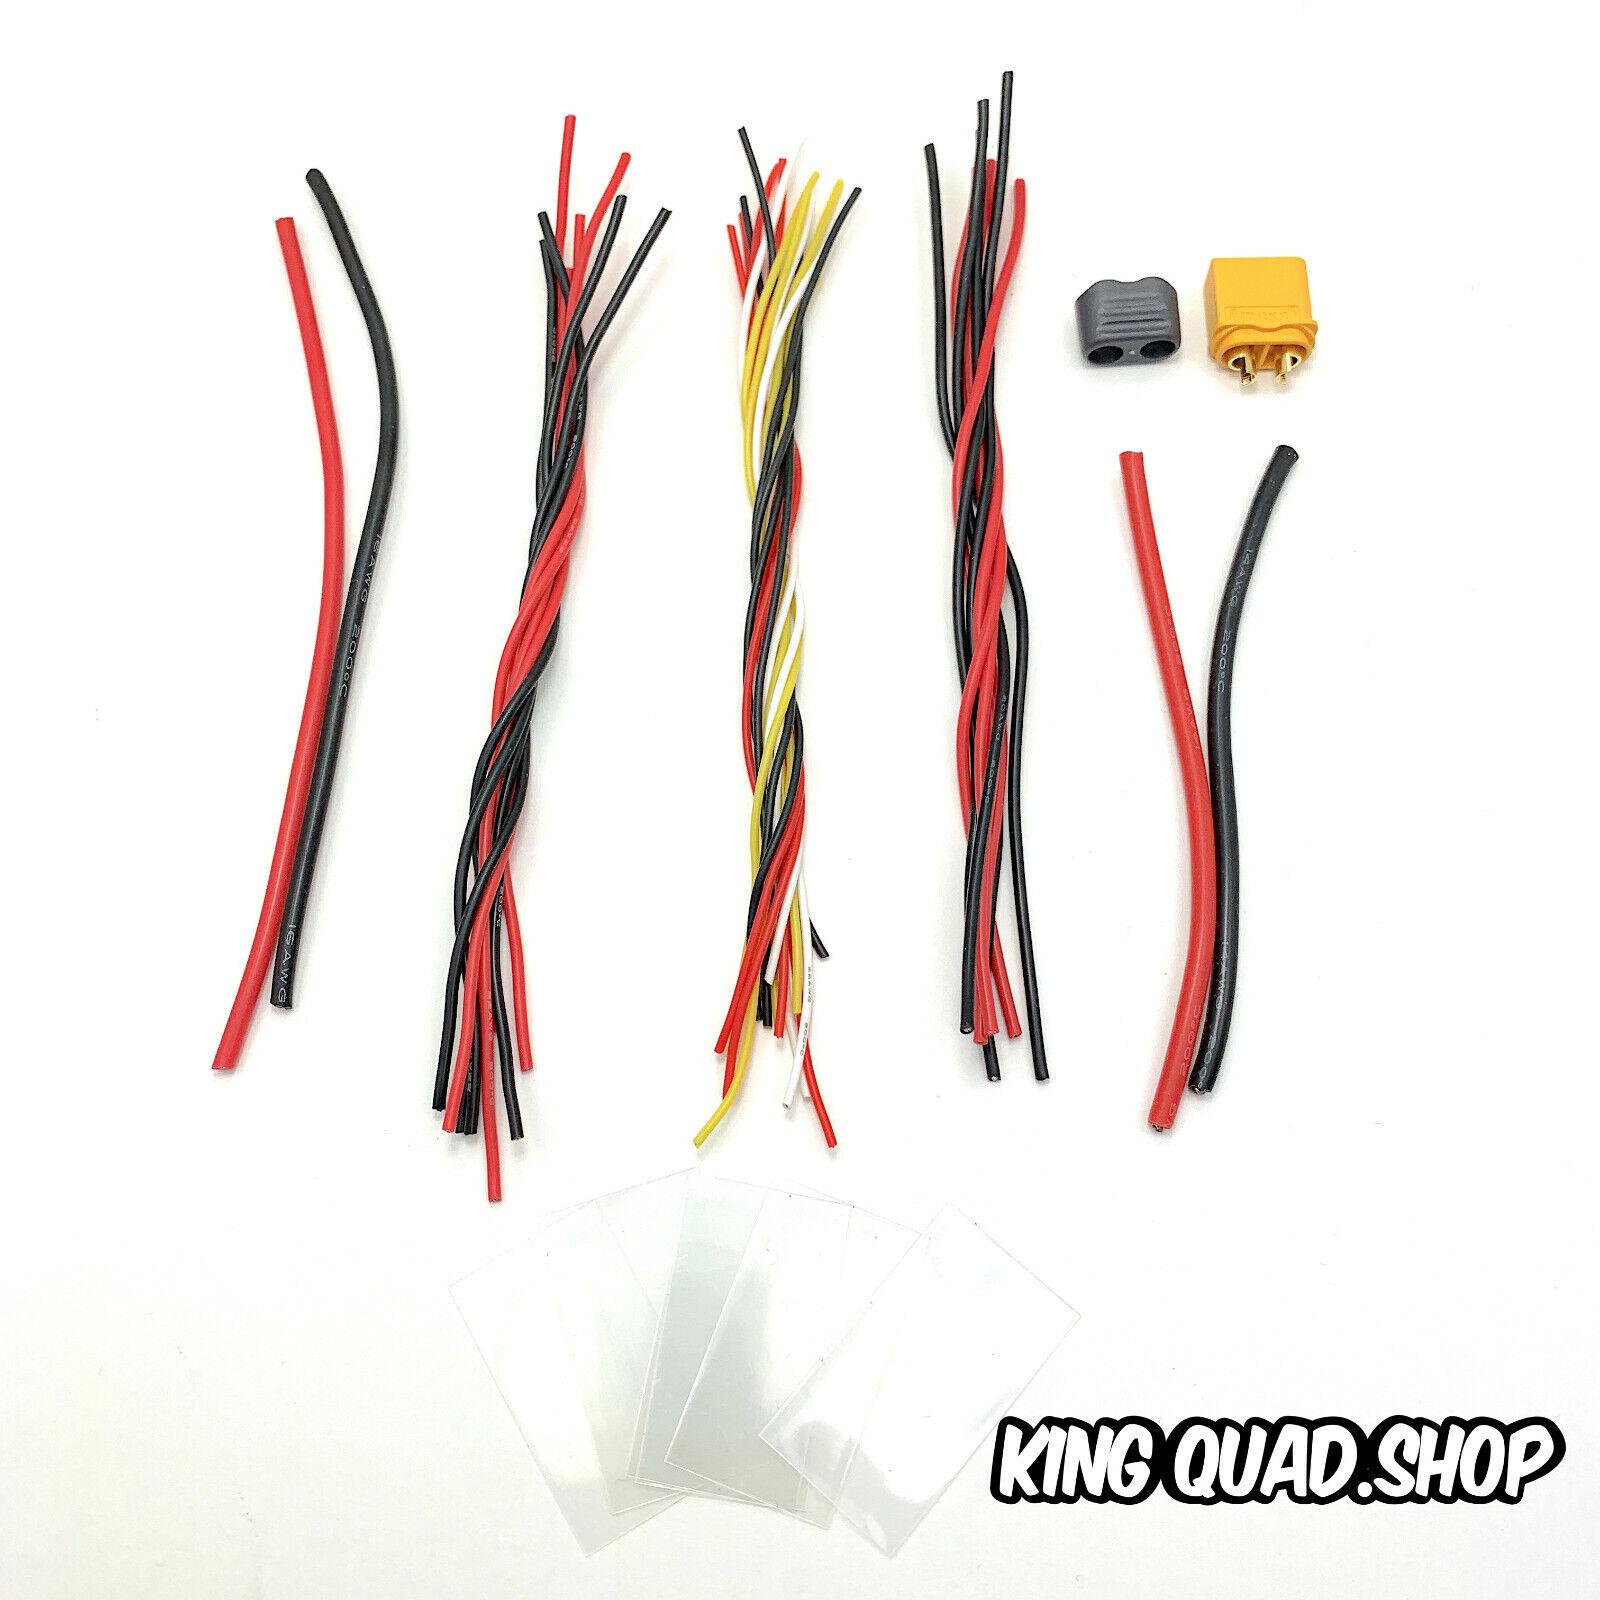 Quadcopter/Drone Build Cable Set For ESC & FC (KISS/Betaflight)